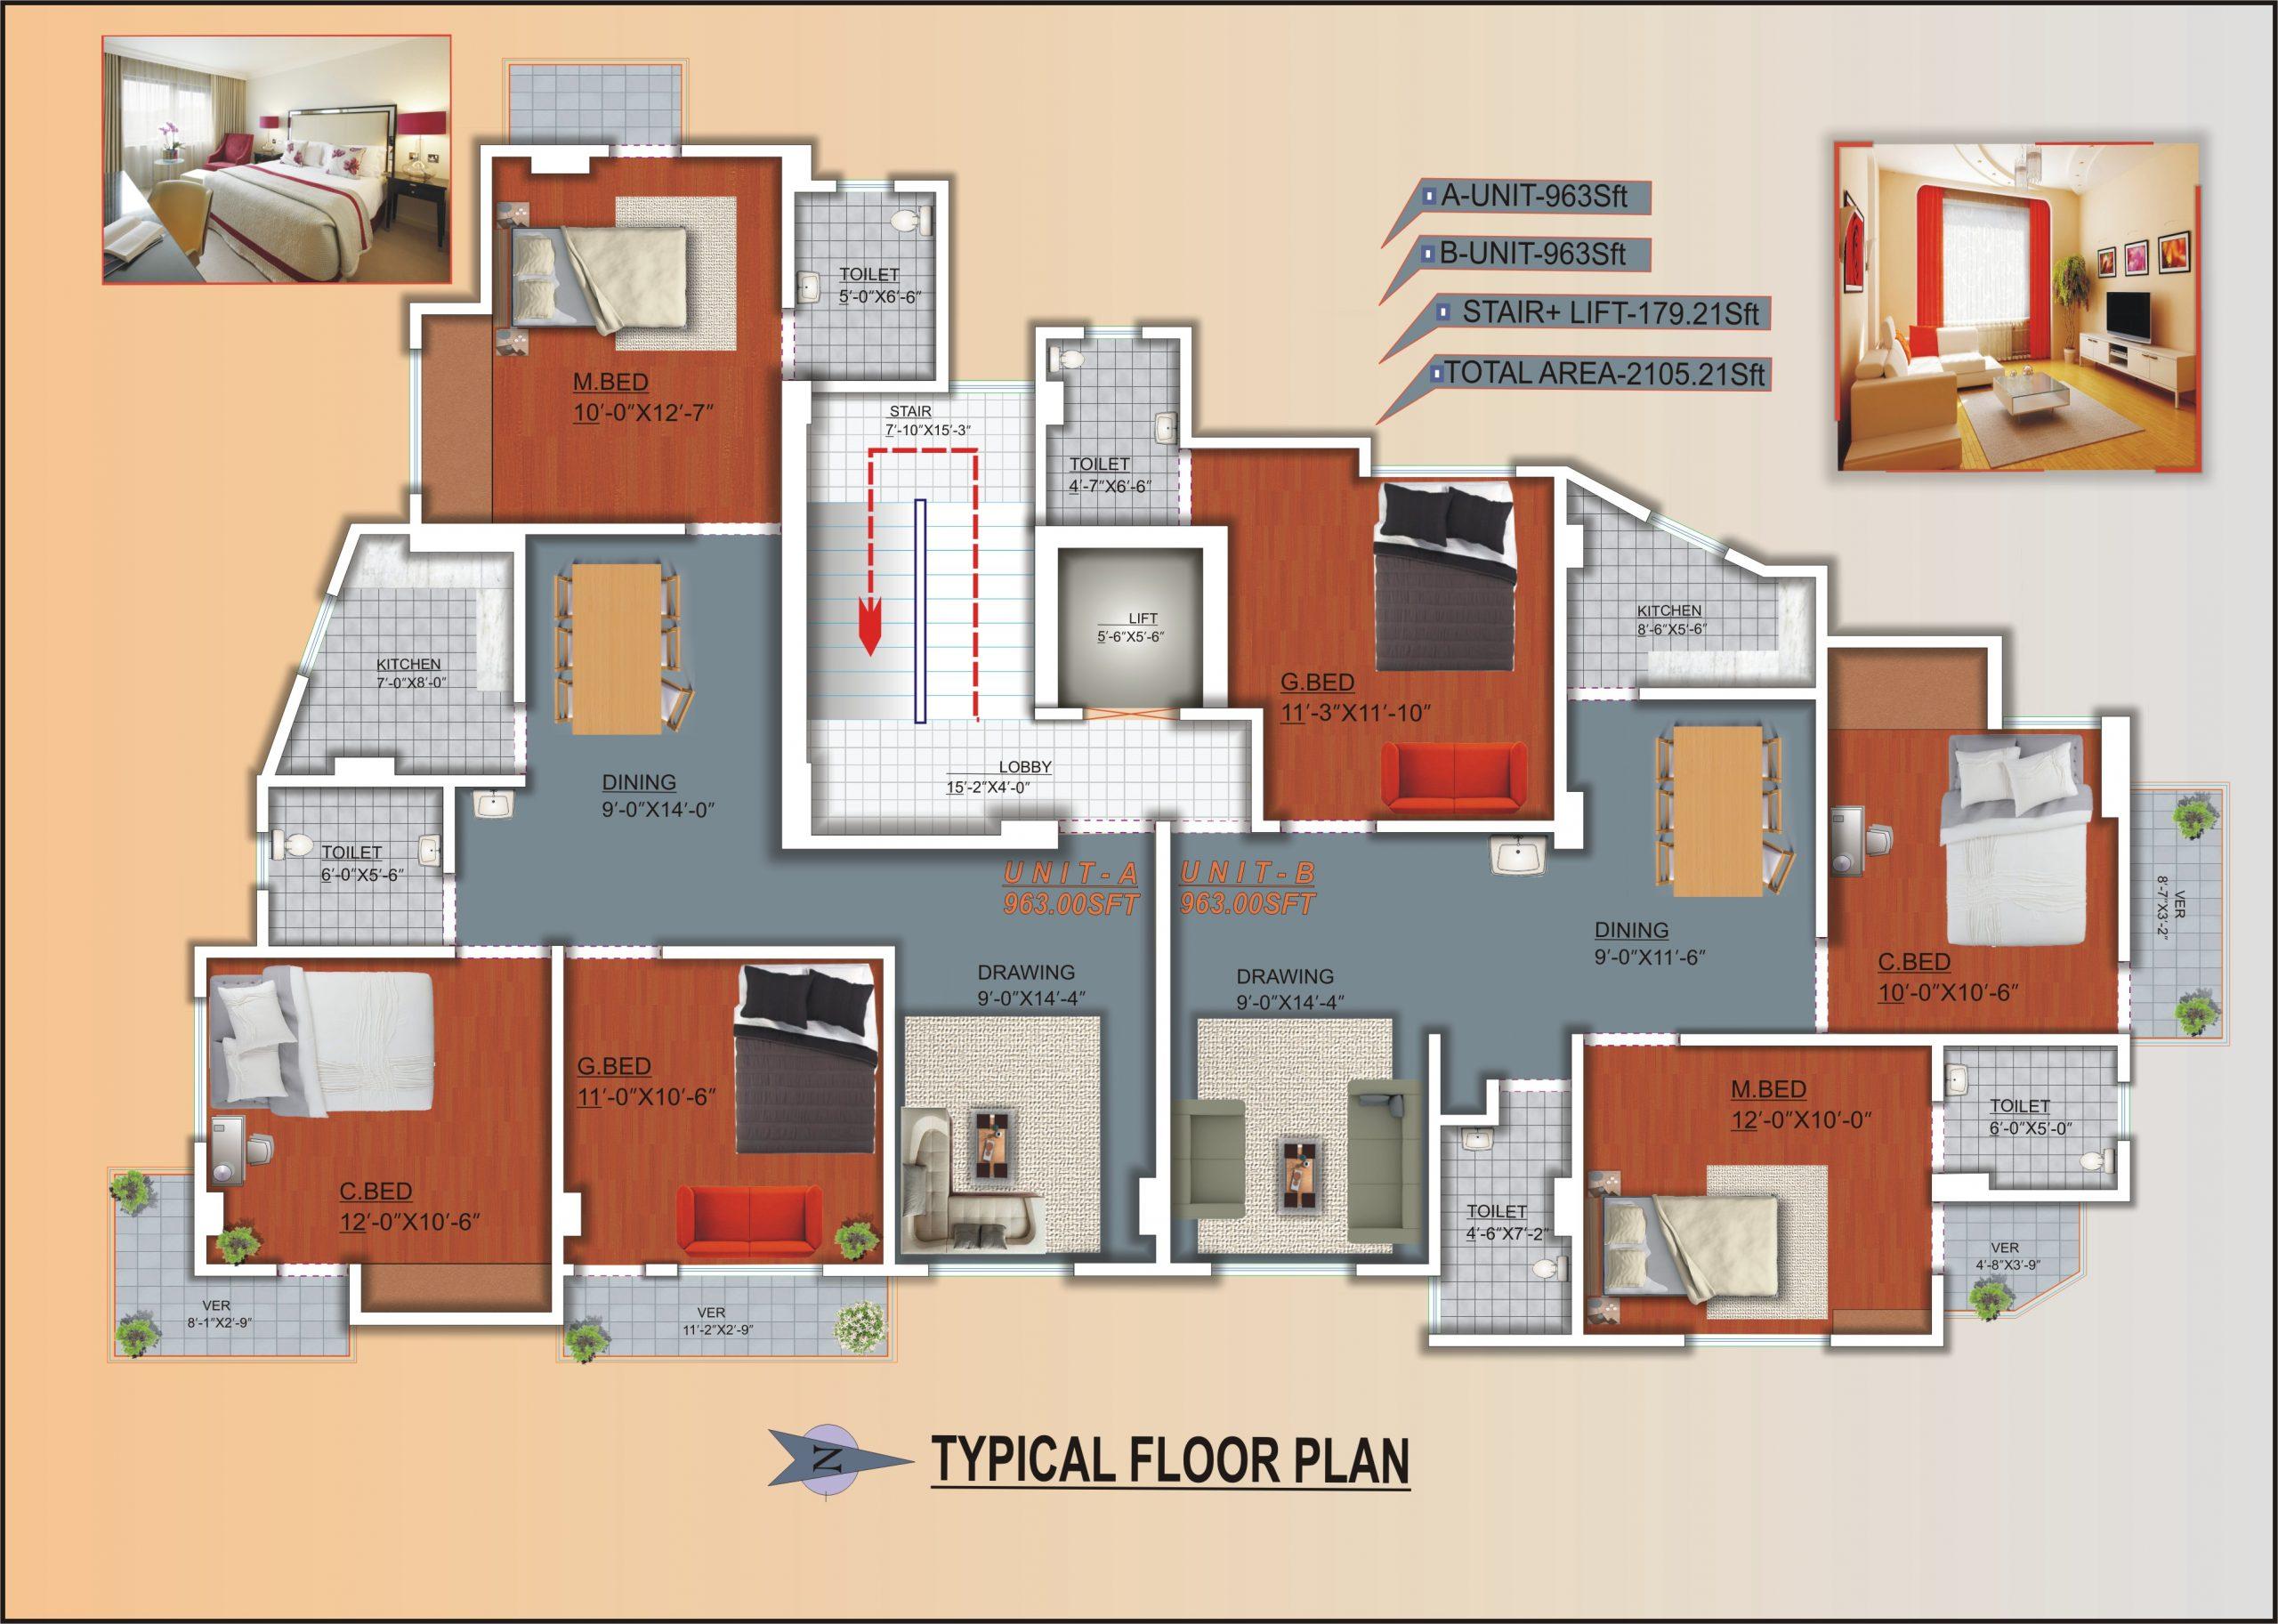 Soiltech Rahmania Garden Floor Plan